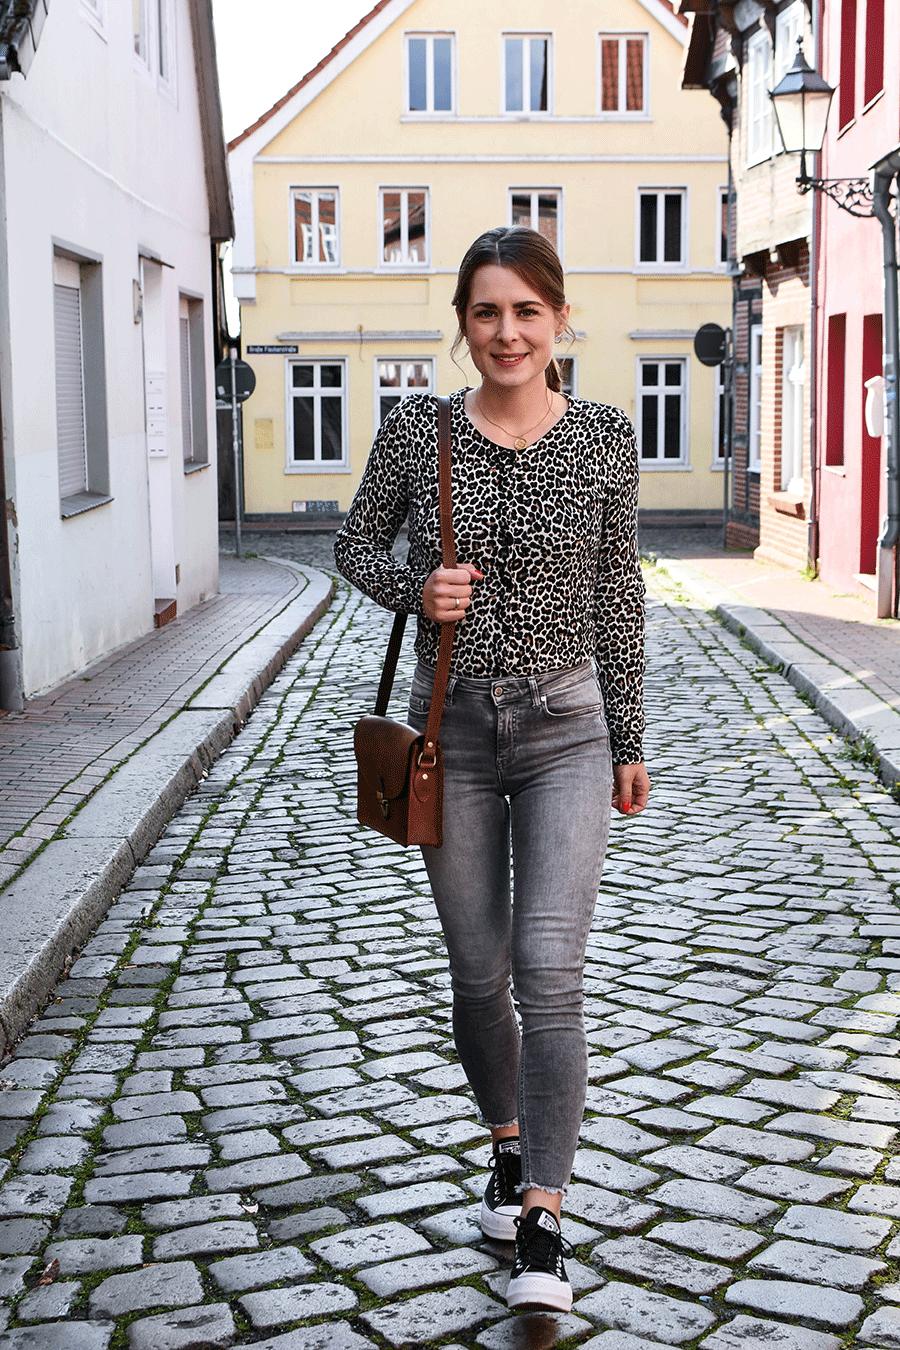 Alltagsoutfit: Jeans, Leoparden-Jacke und Plateau Sneakers